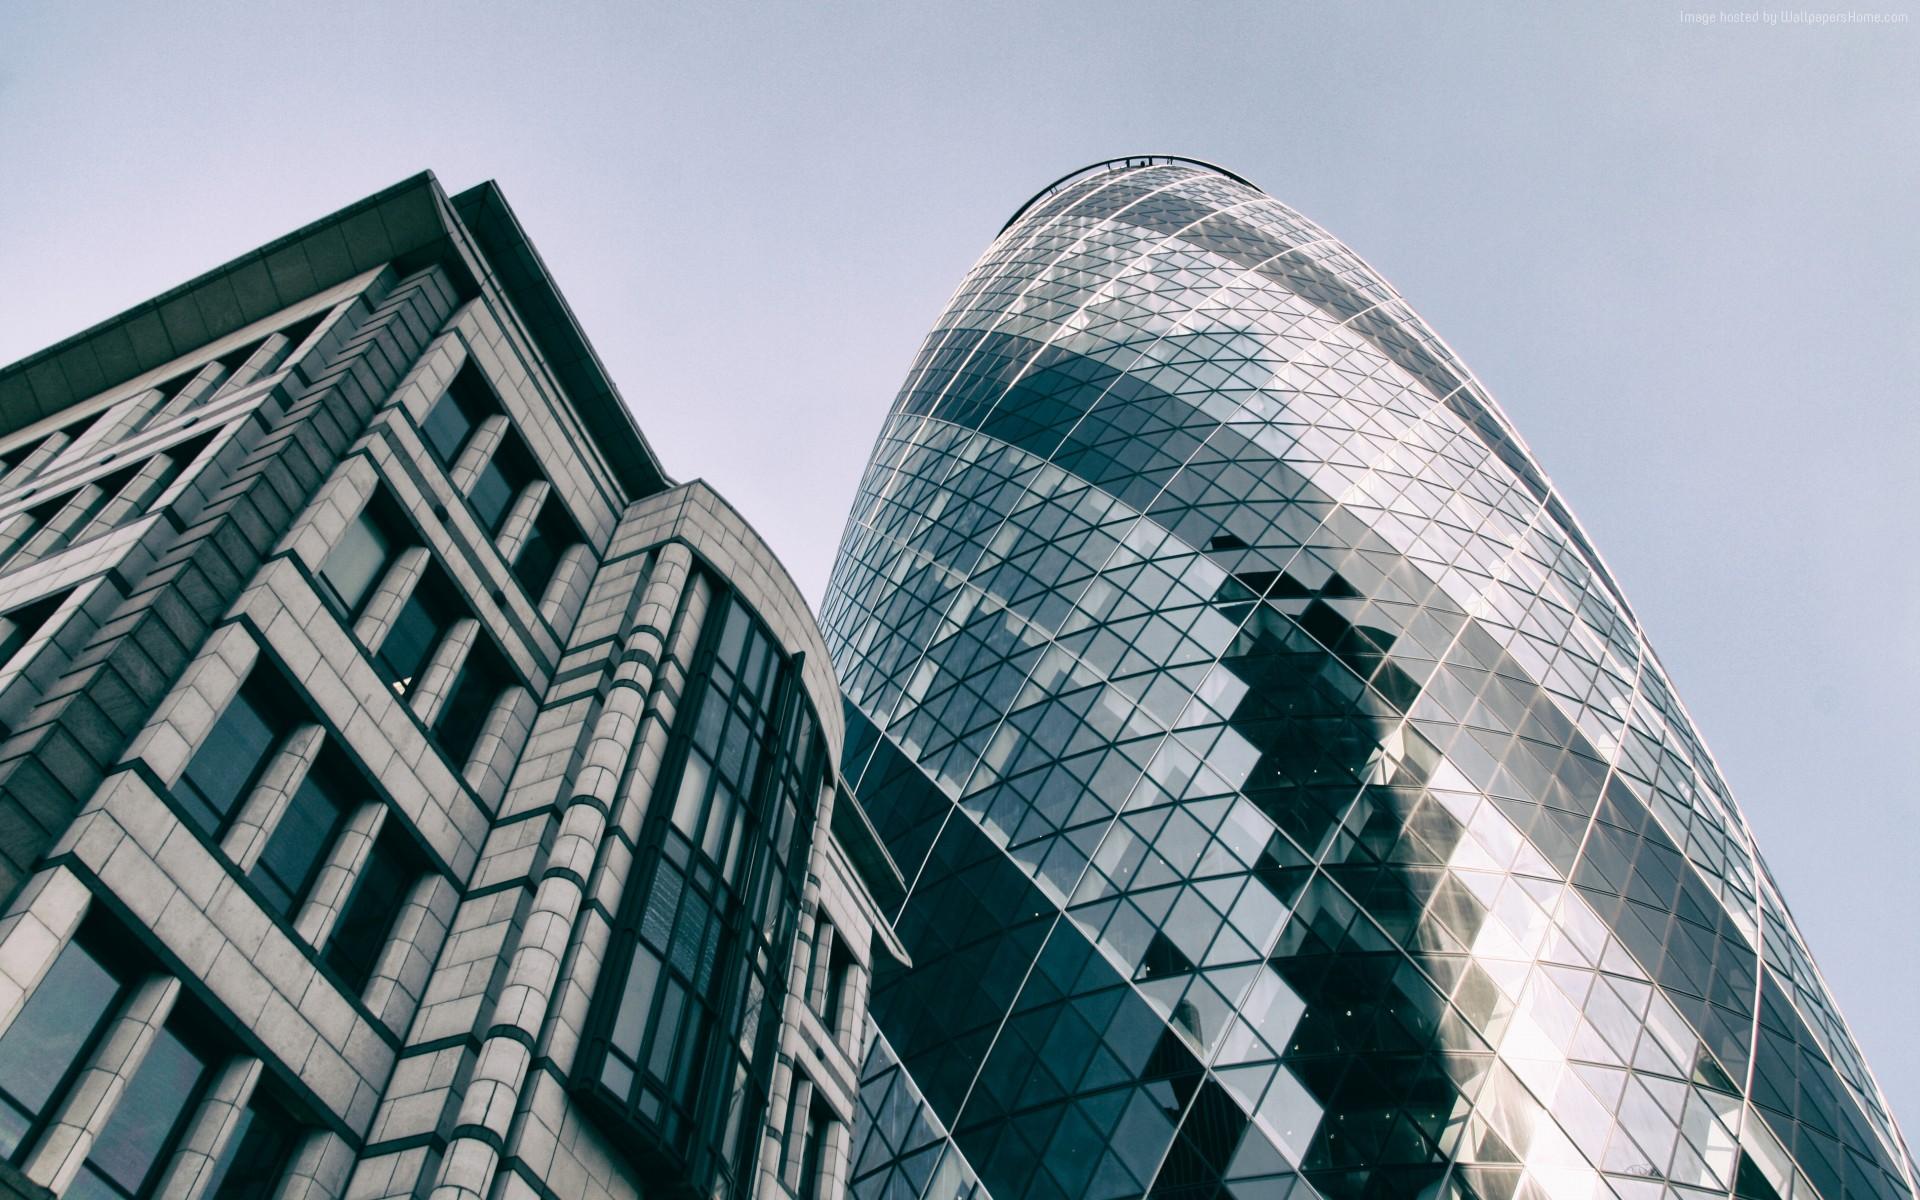 gherkin-building-1920x1200-london-uk-skyscrapers-6178.jpg